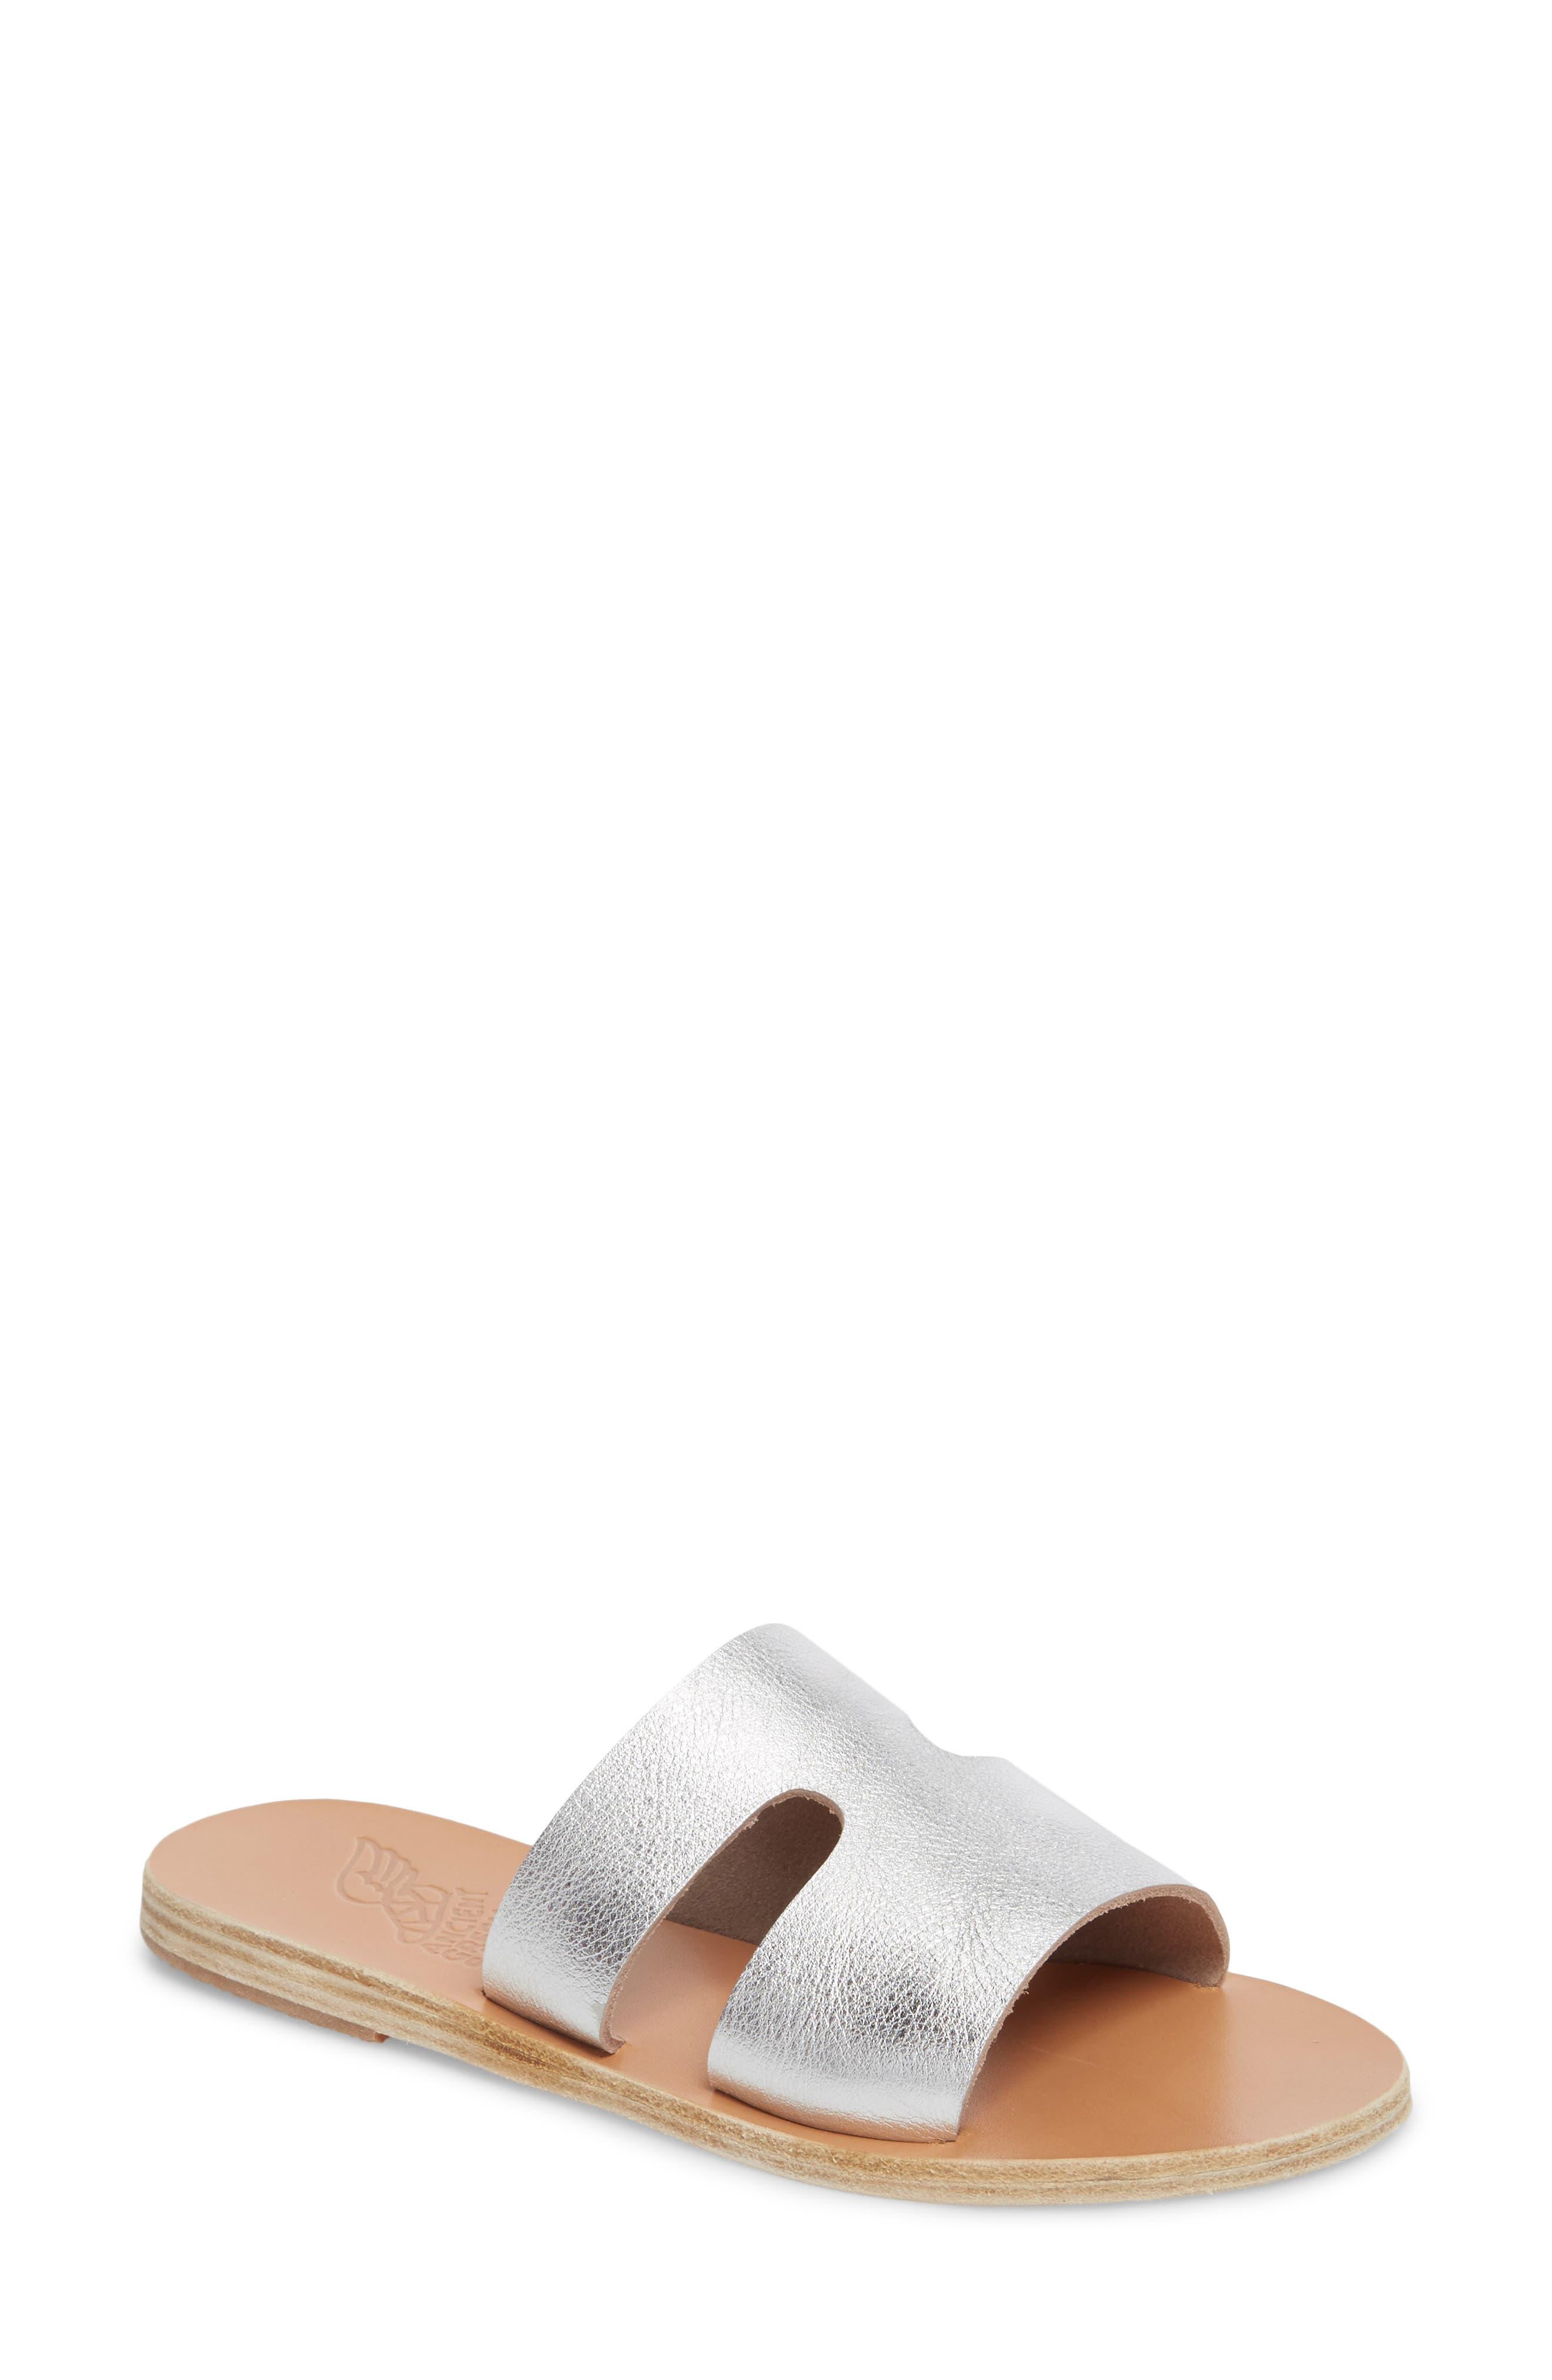 Apteros Slide Sandal,                             Main thumbnail 1, color,                             METAL SILVER